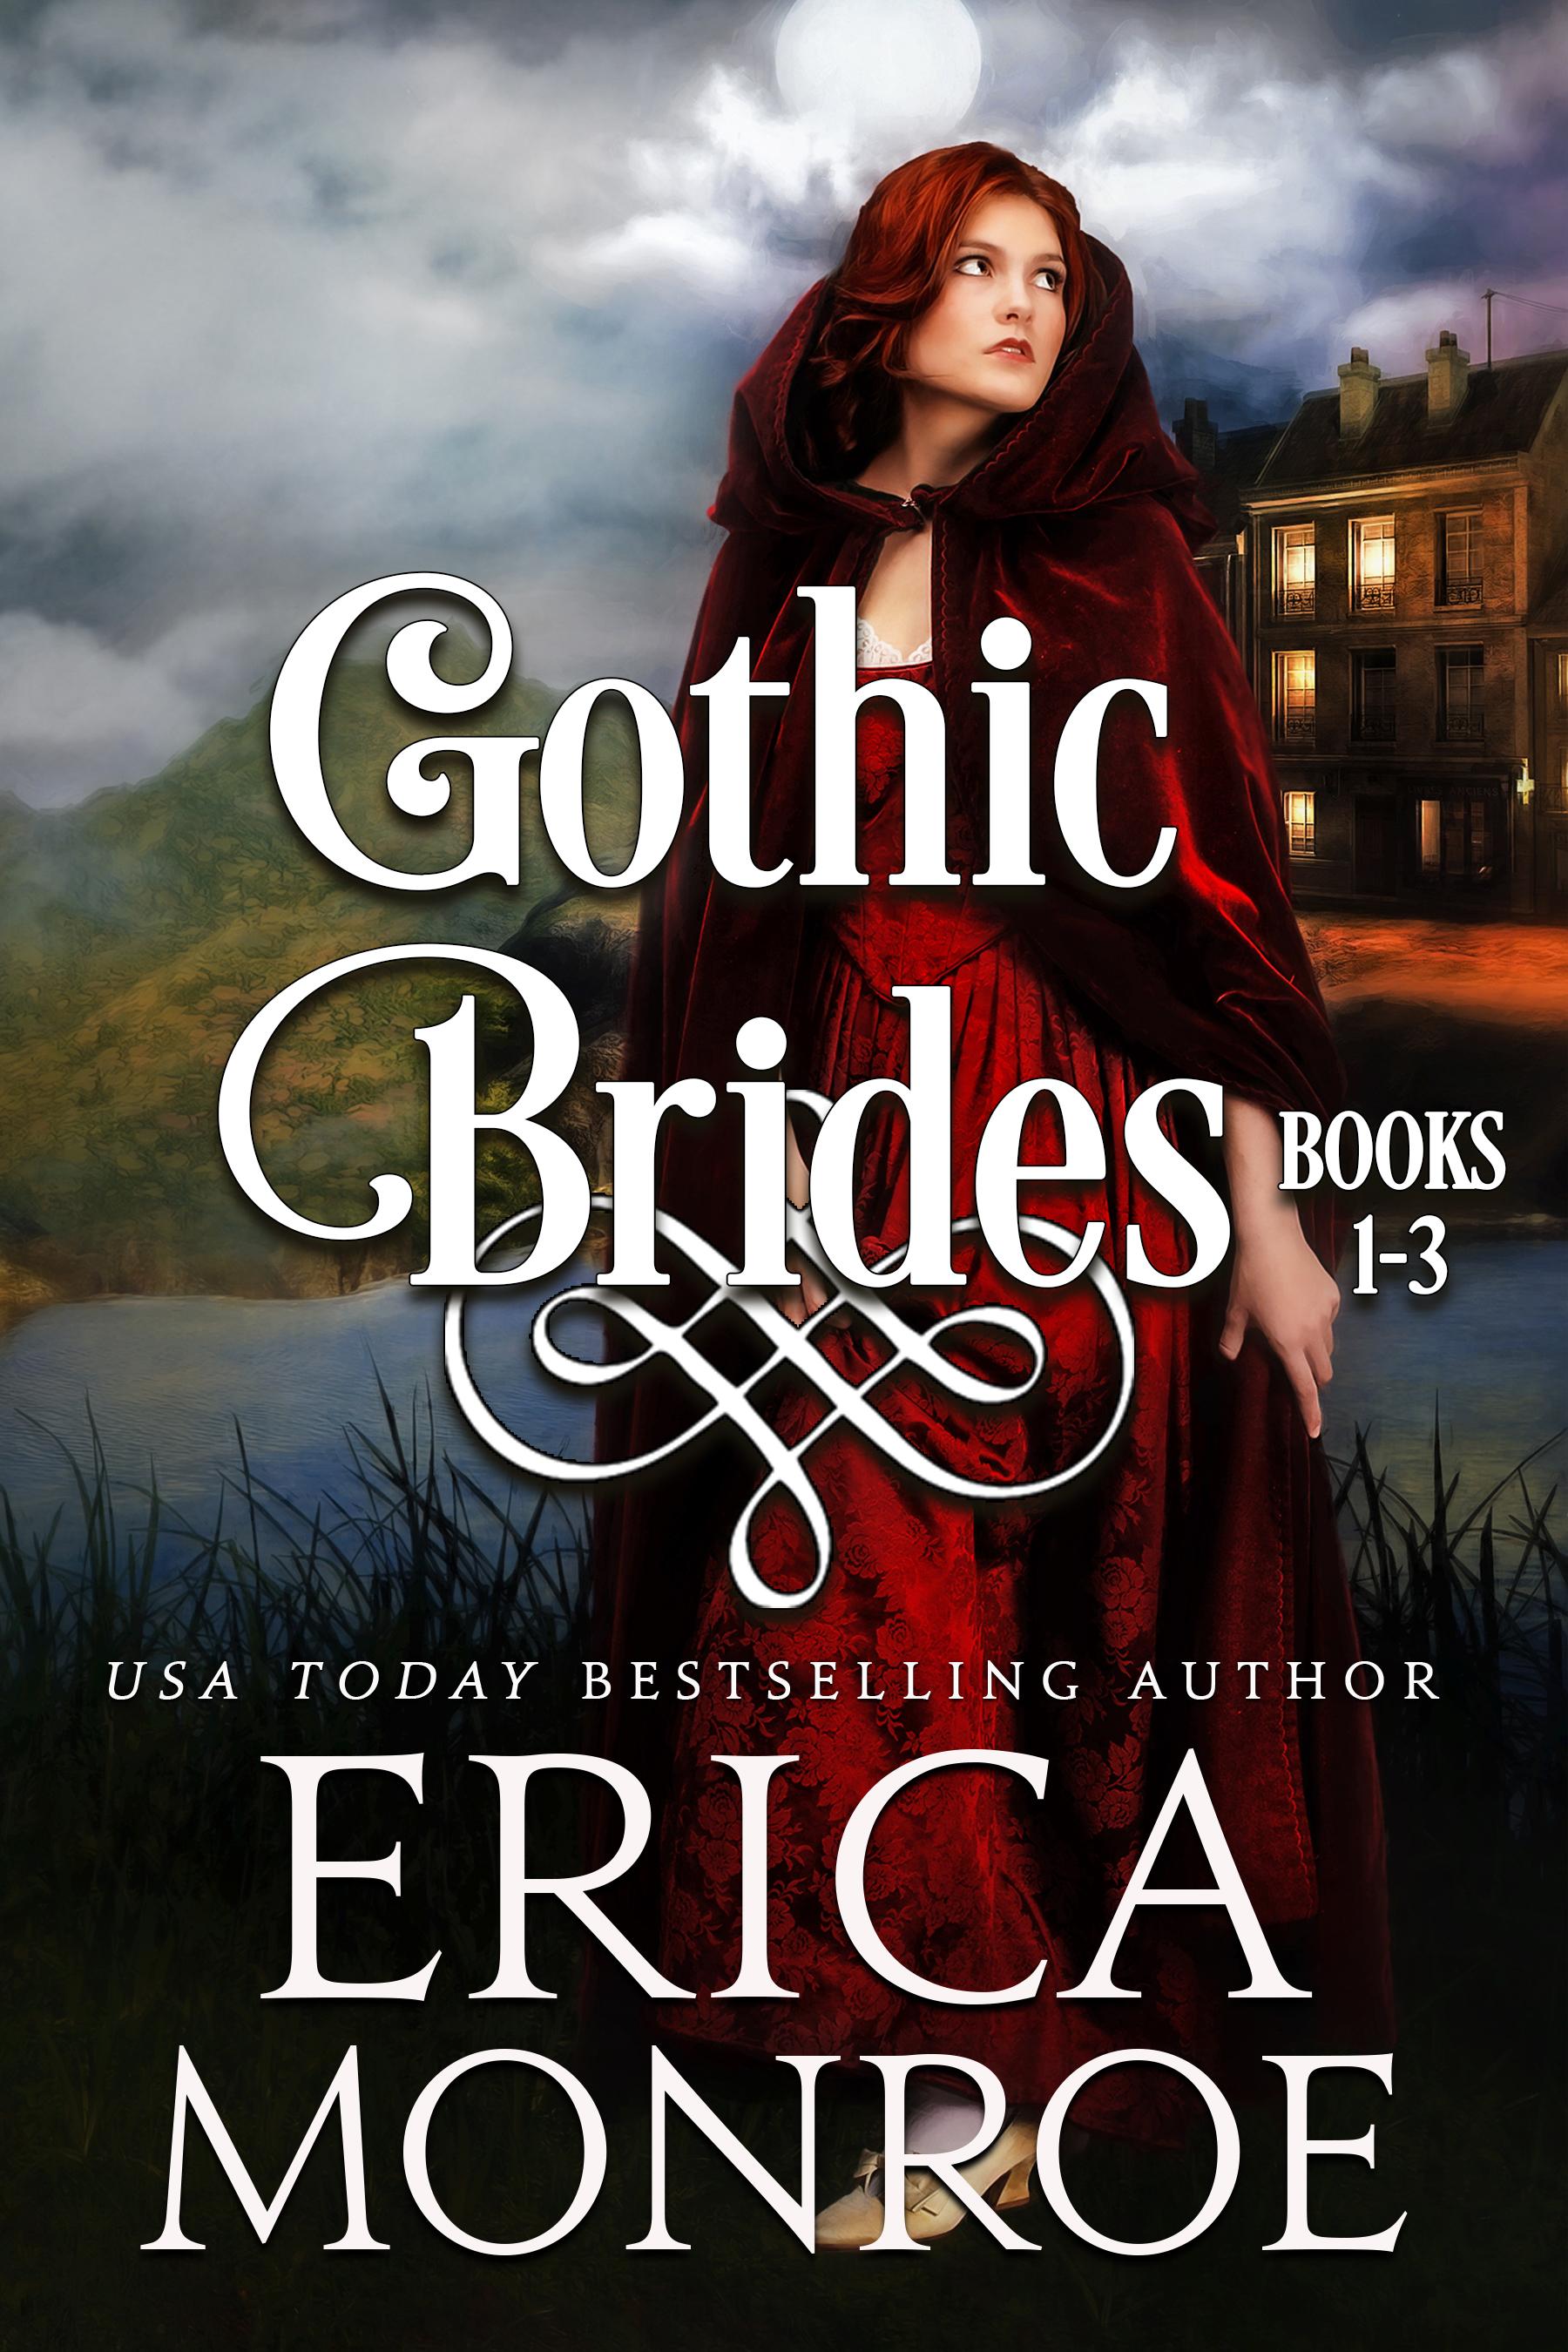 Gothic Brides: Volume 1, an Ebook by Erica Monroe